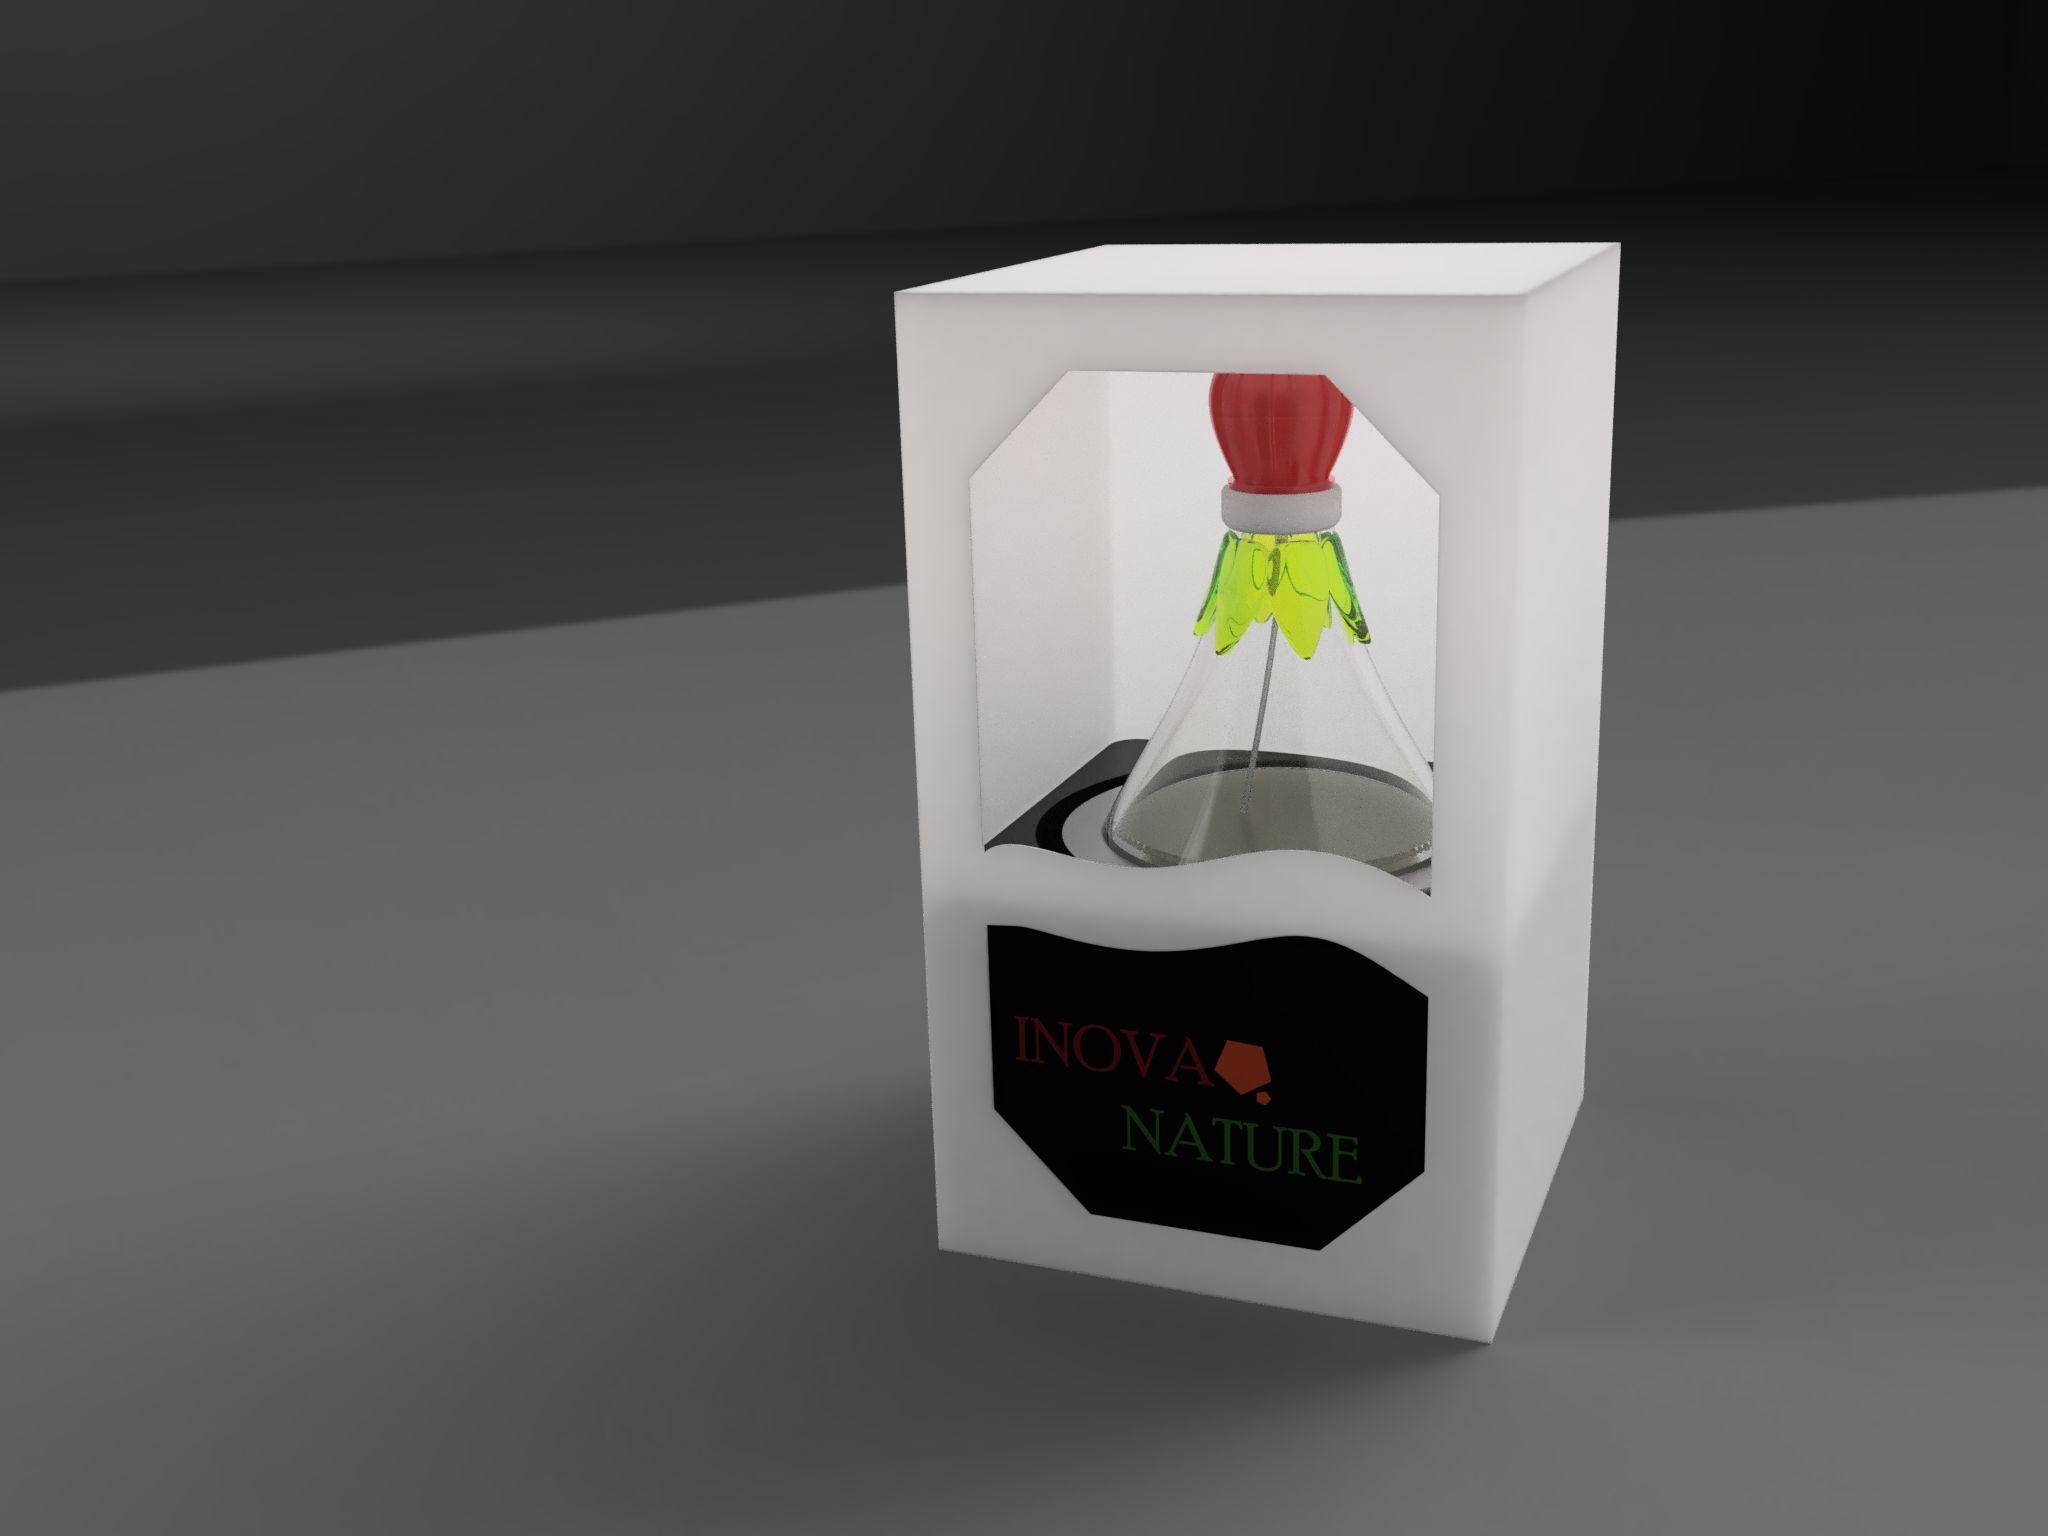 Envase-de-perfume--empaque--inova-nature-2019-oct-14-07-36-00am-000-customizedview30194688035-png-3500-3500